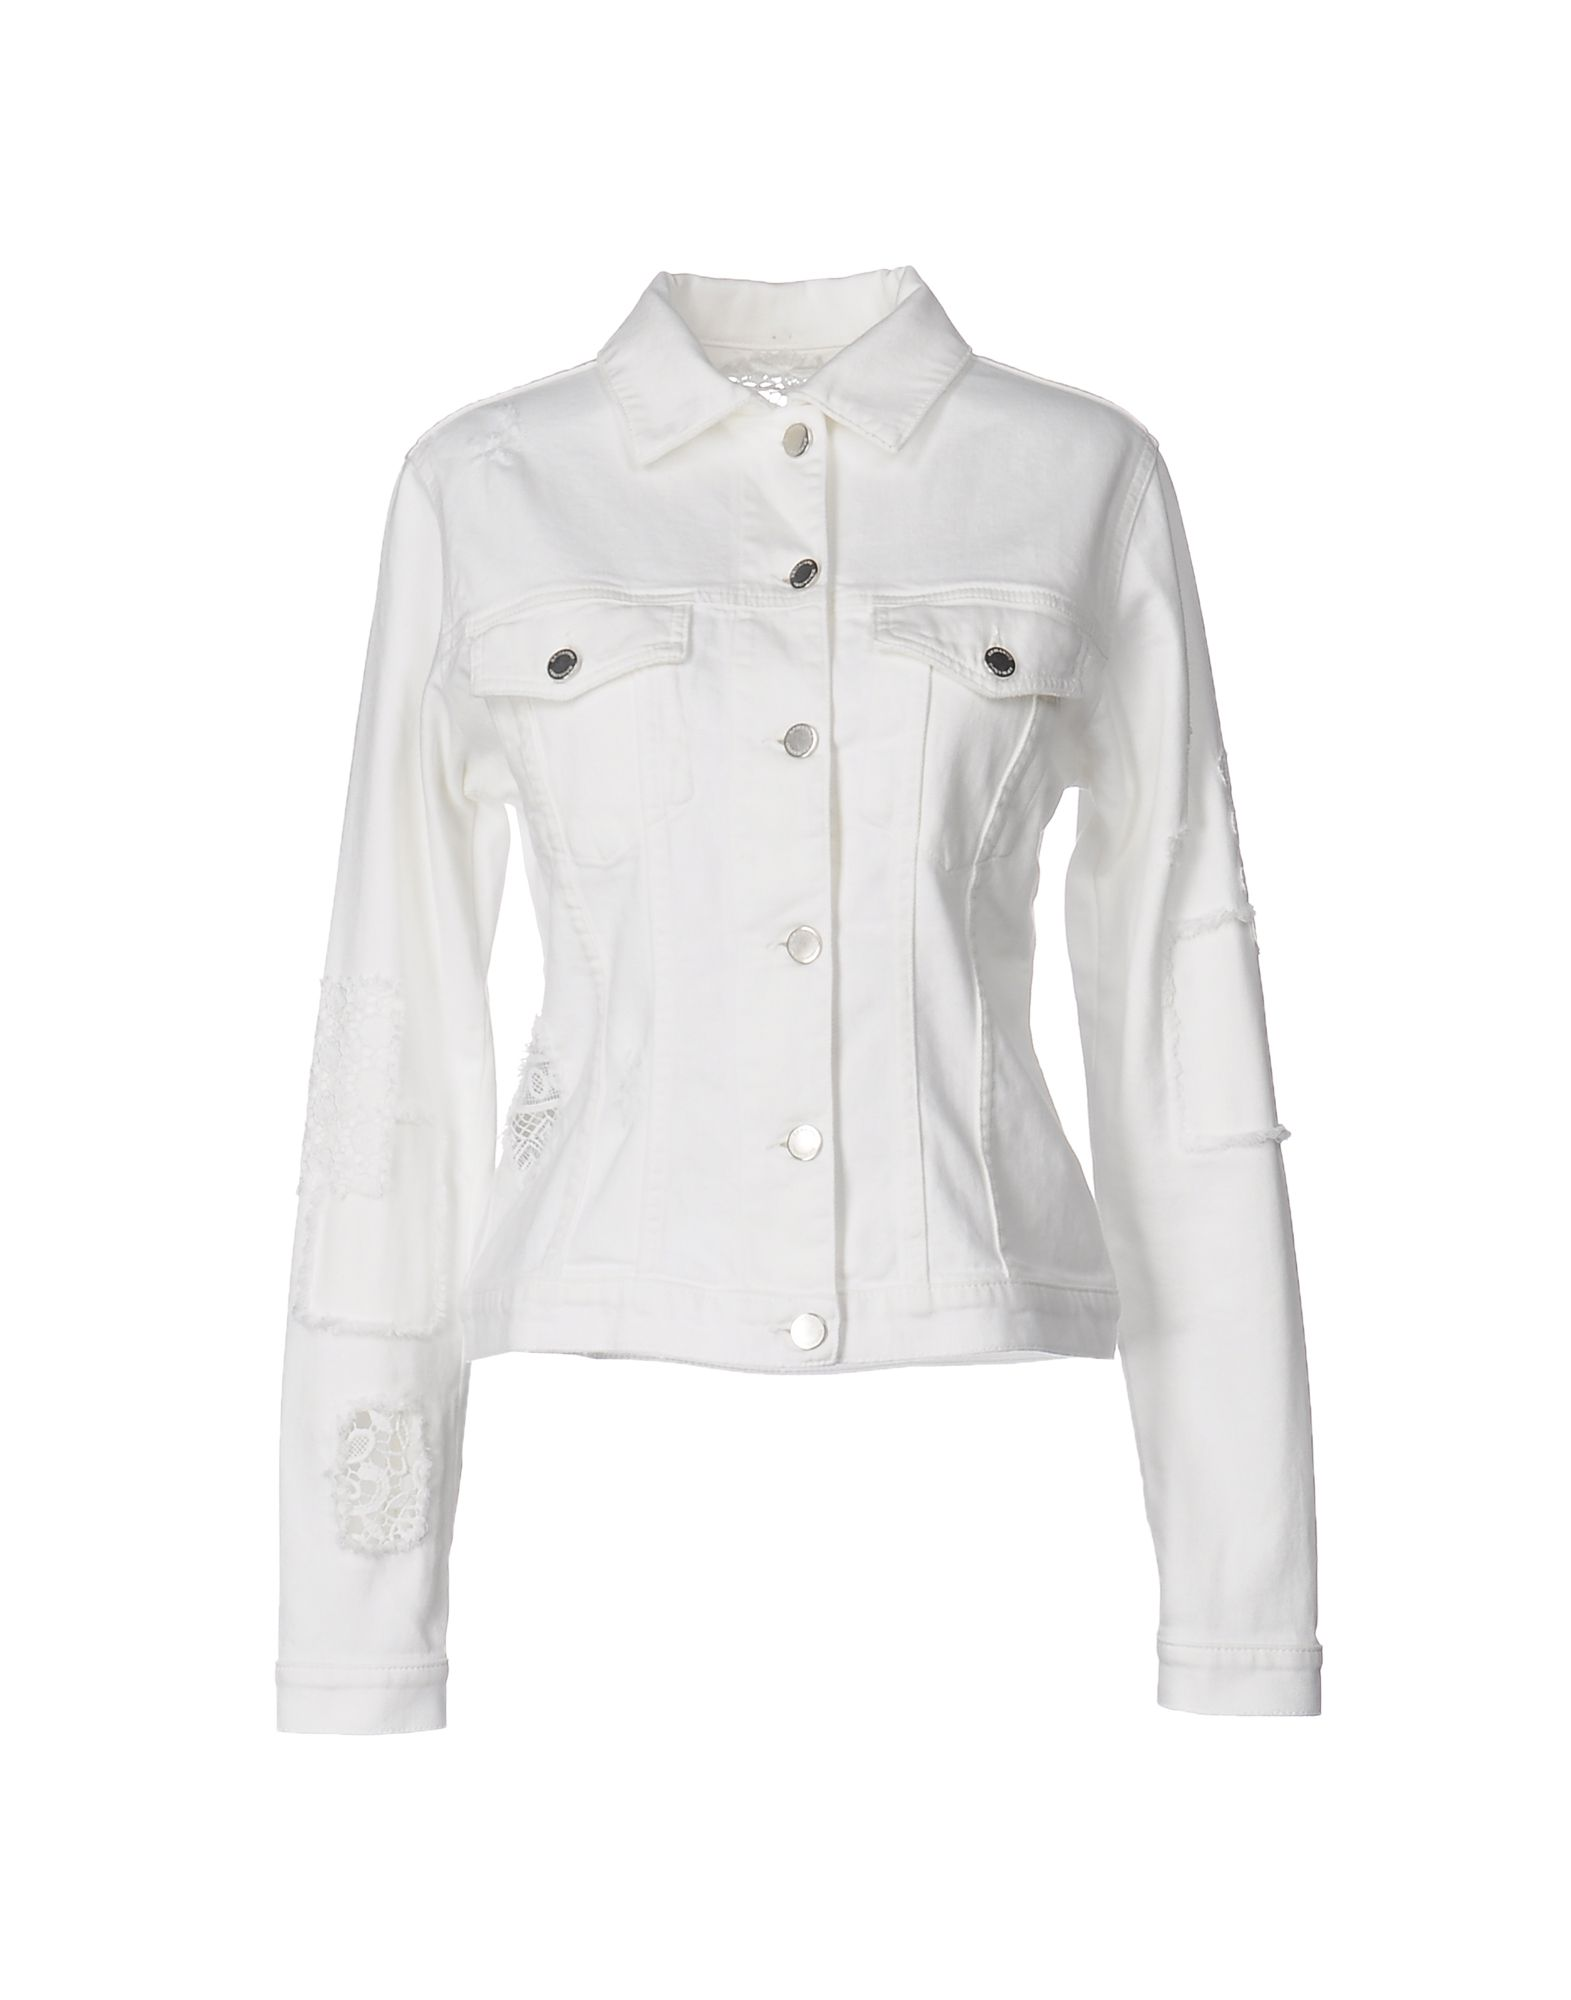 цена ERMANNO DI ERMANNO SCERVINO Джинсовая верхняя одежда онлайн в 2017 году